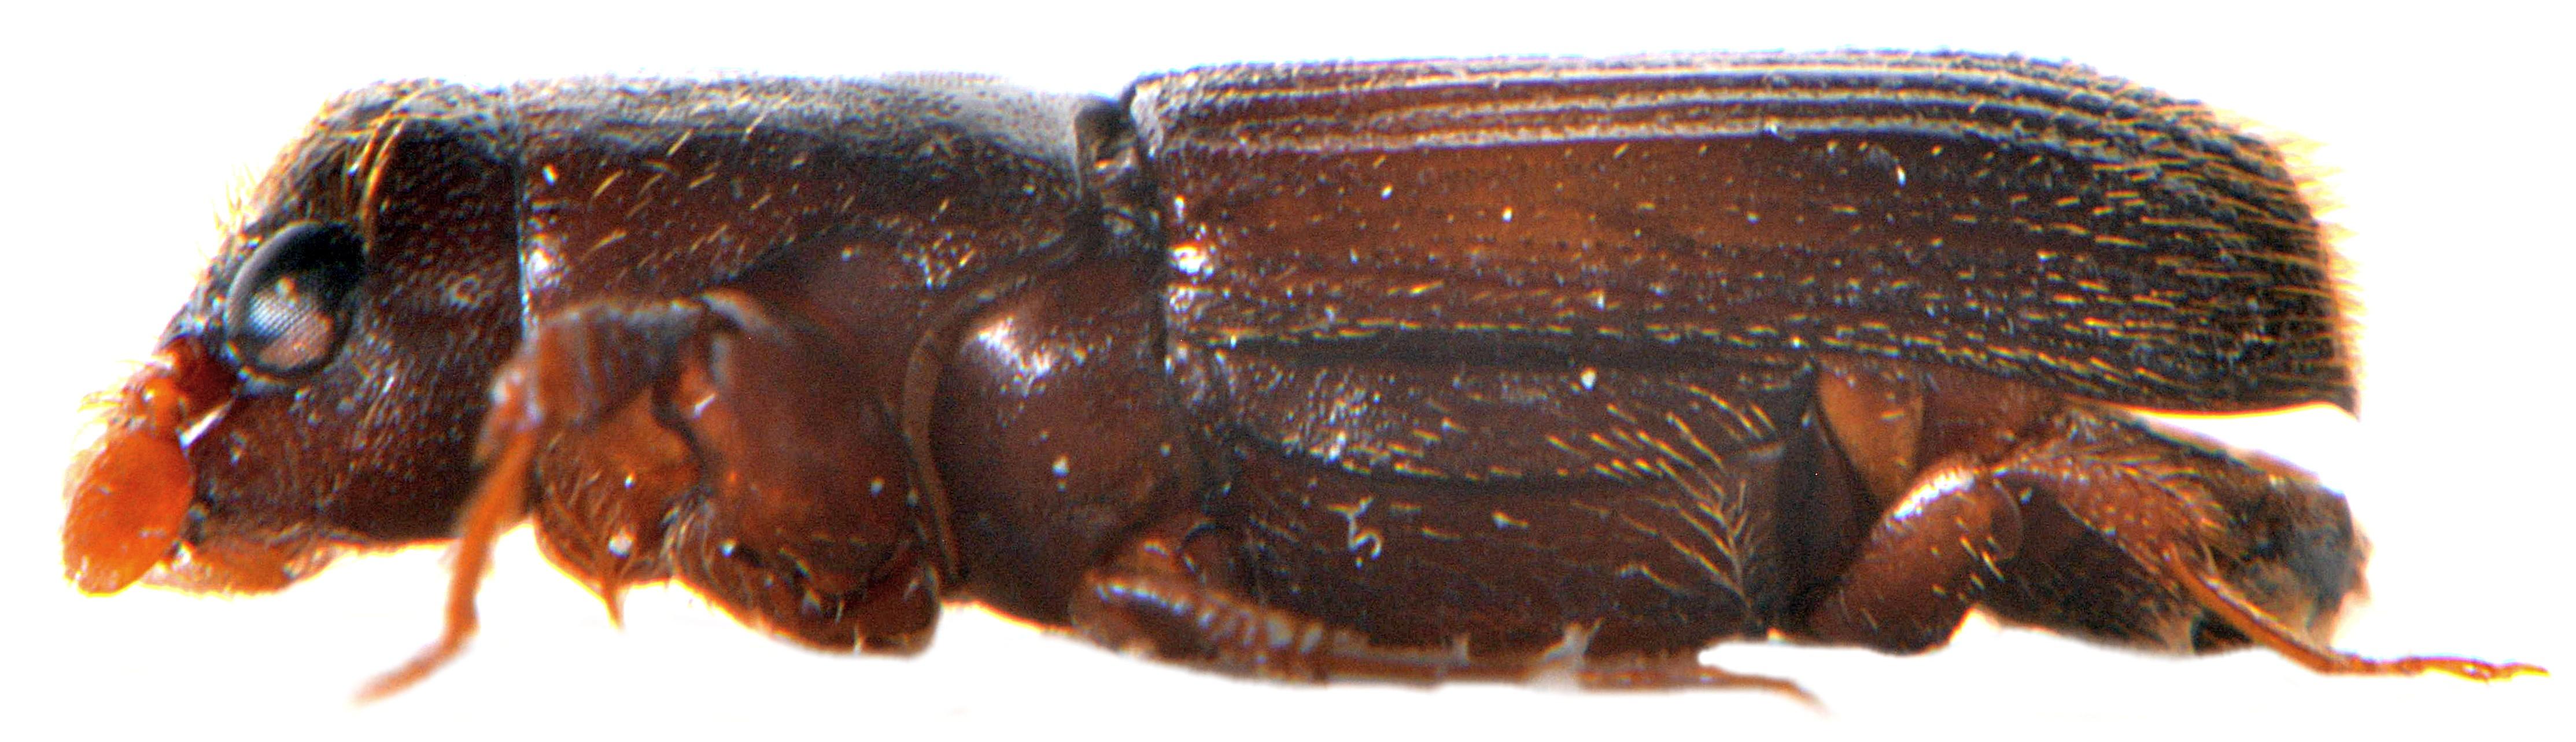 Platypus cylindrus ♀